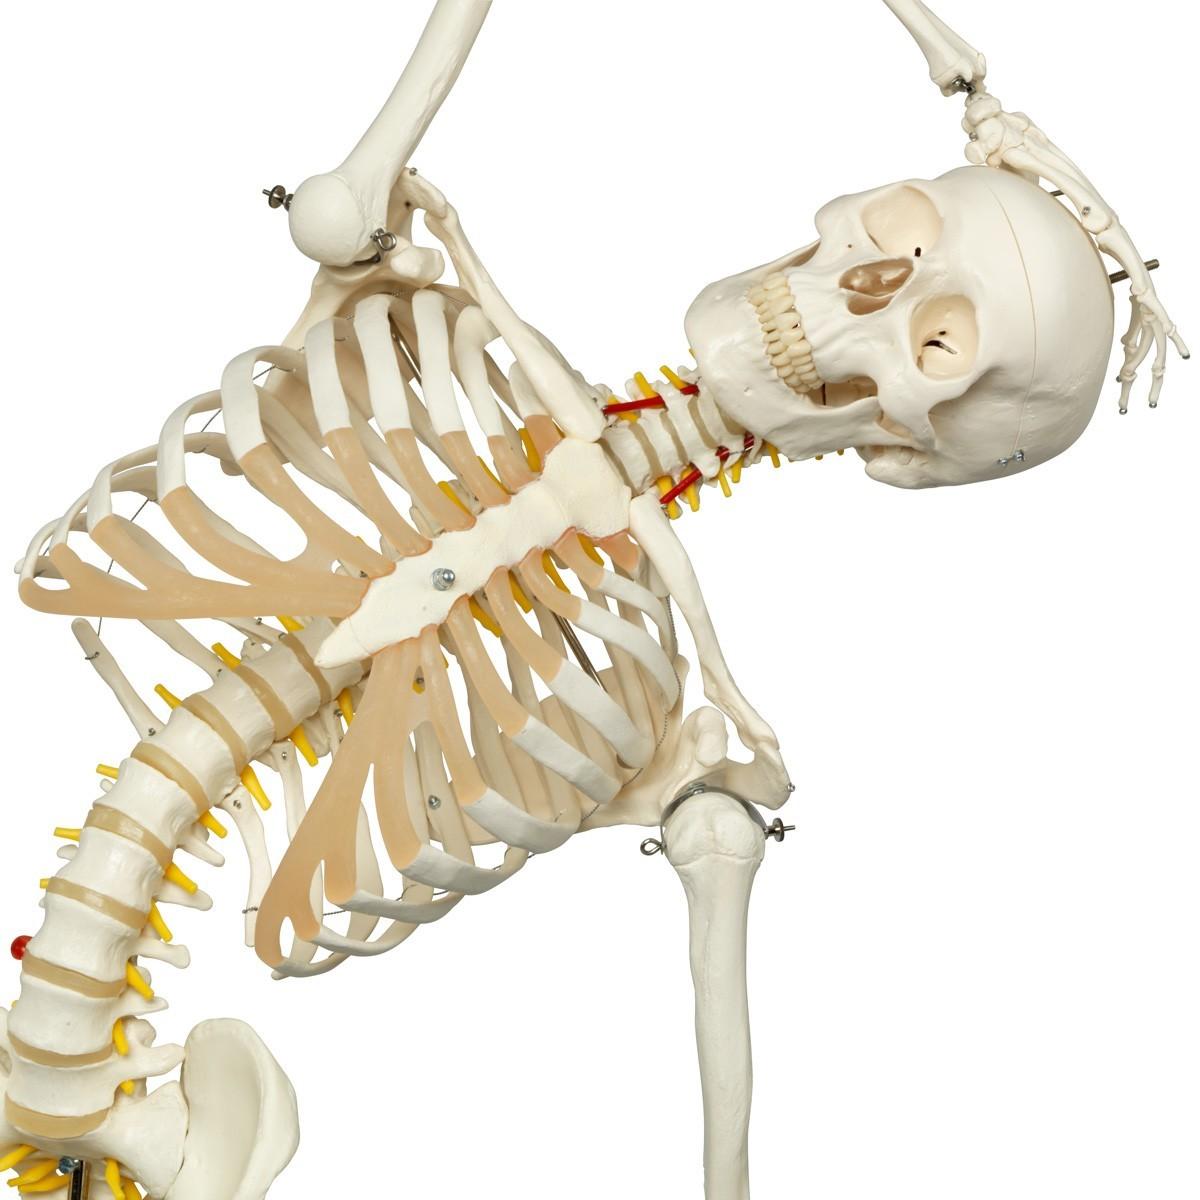 3b Scientific A15 Skeleton Model